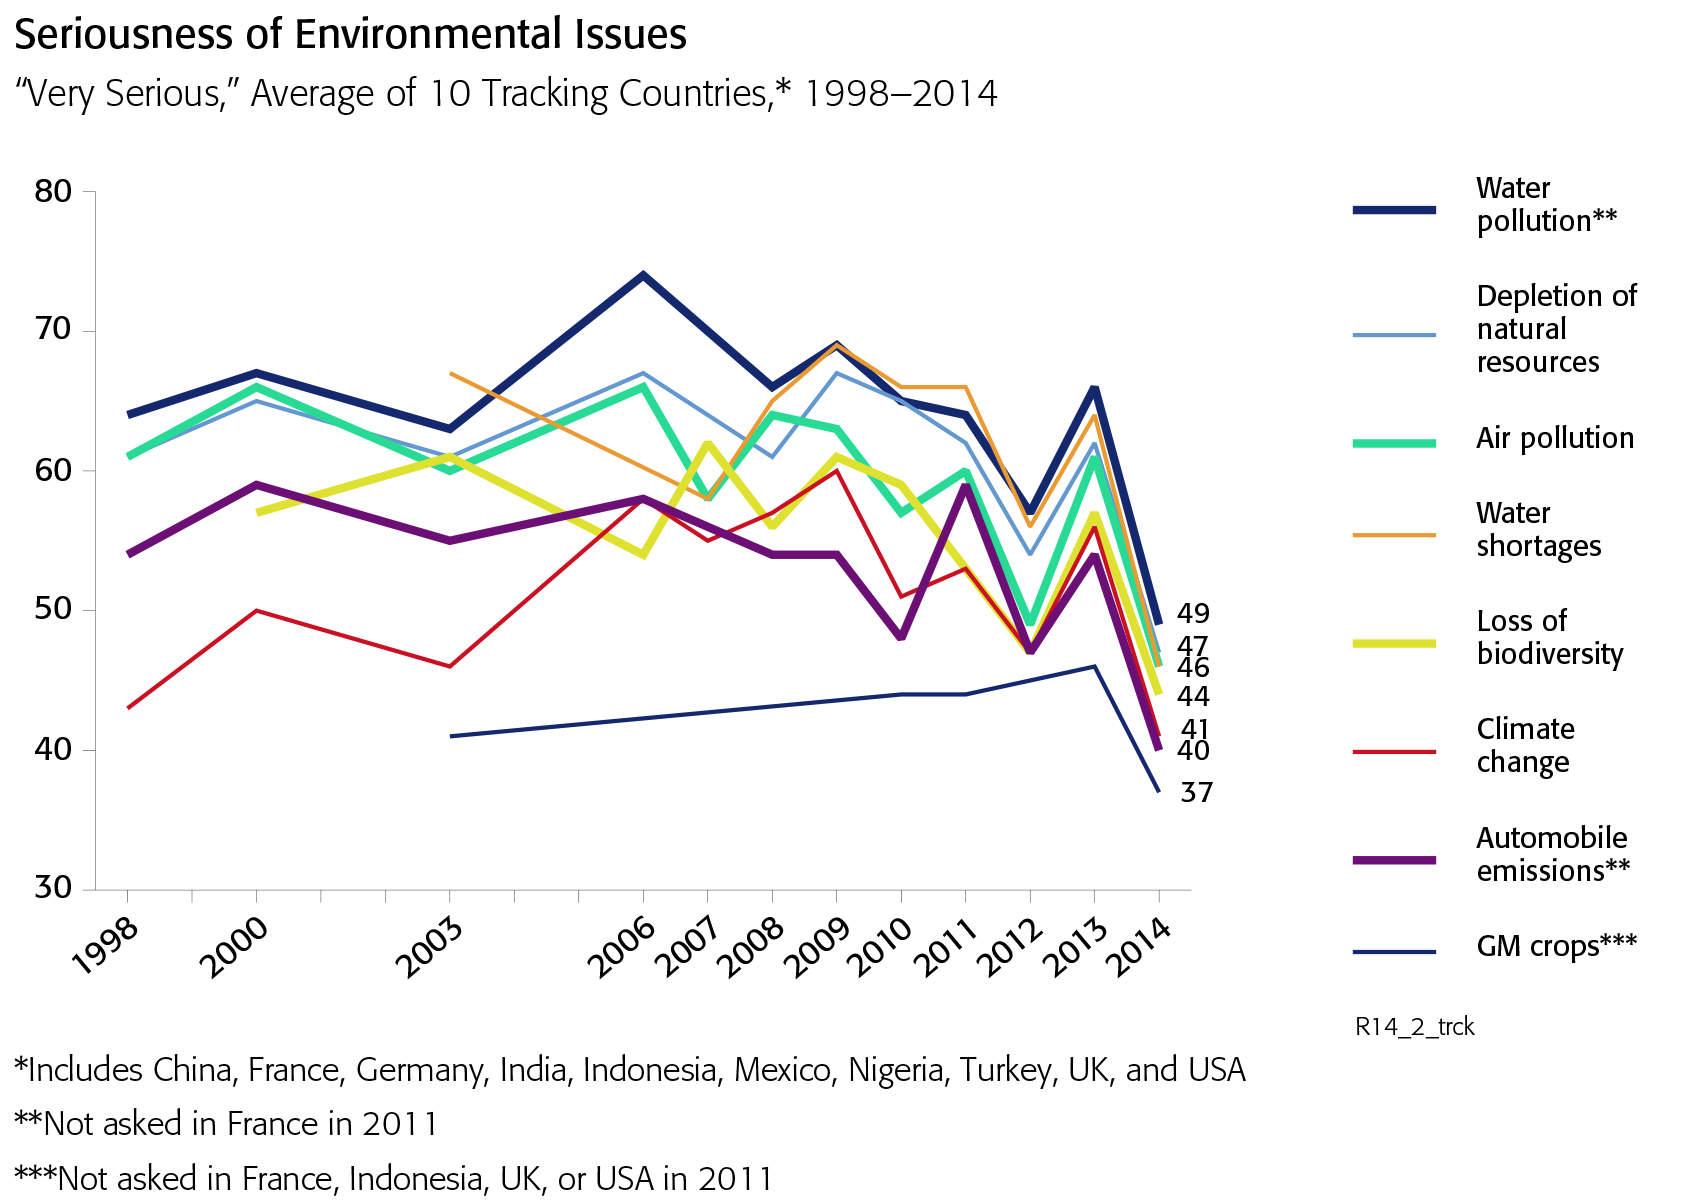 Enviromental issues chart